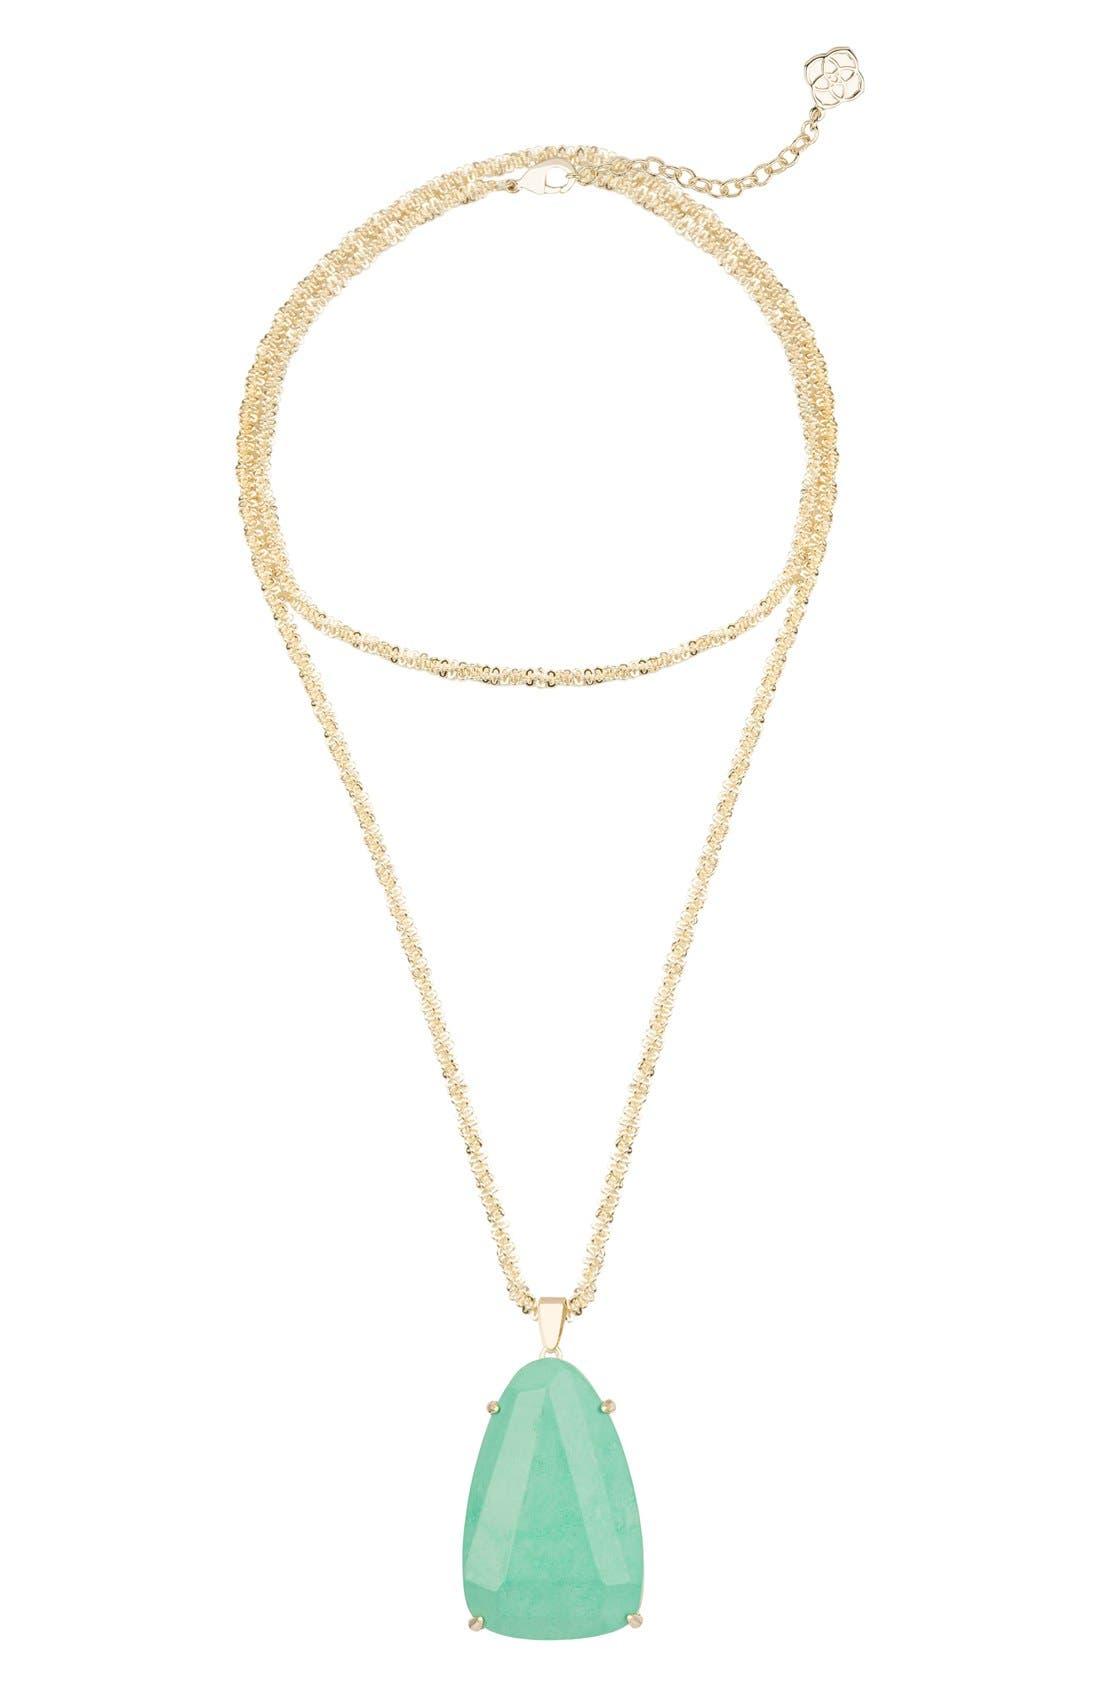 Alternate Image 1 Selected - Kendra Scott 'Sandra' Long Pendant Necklace